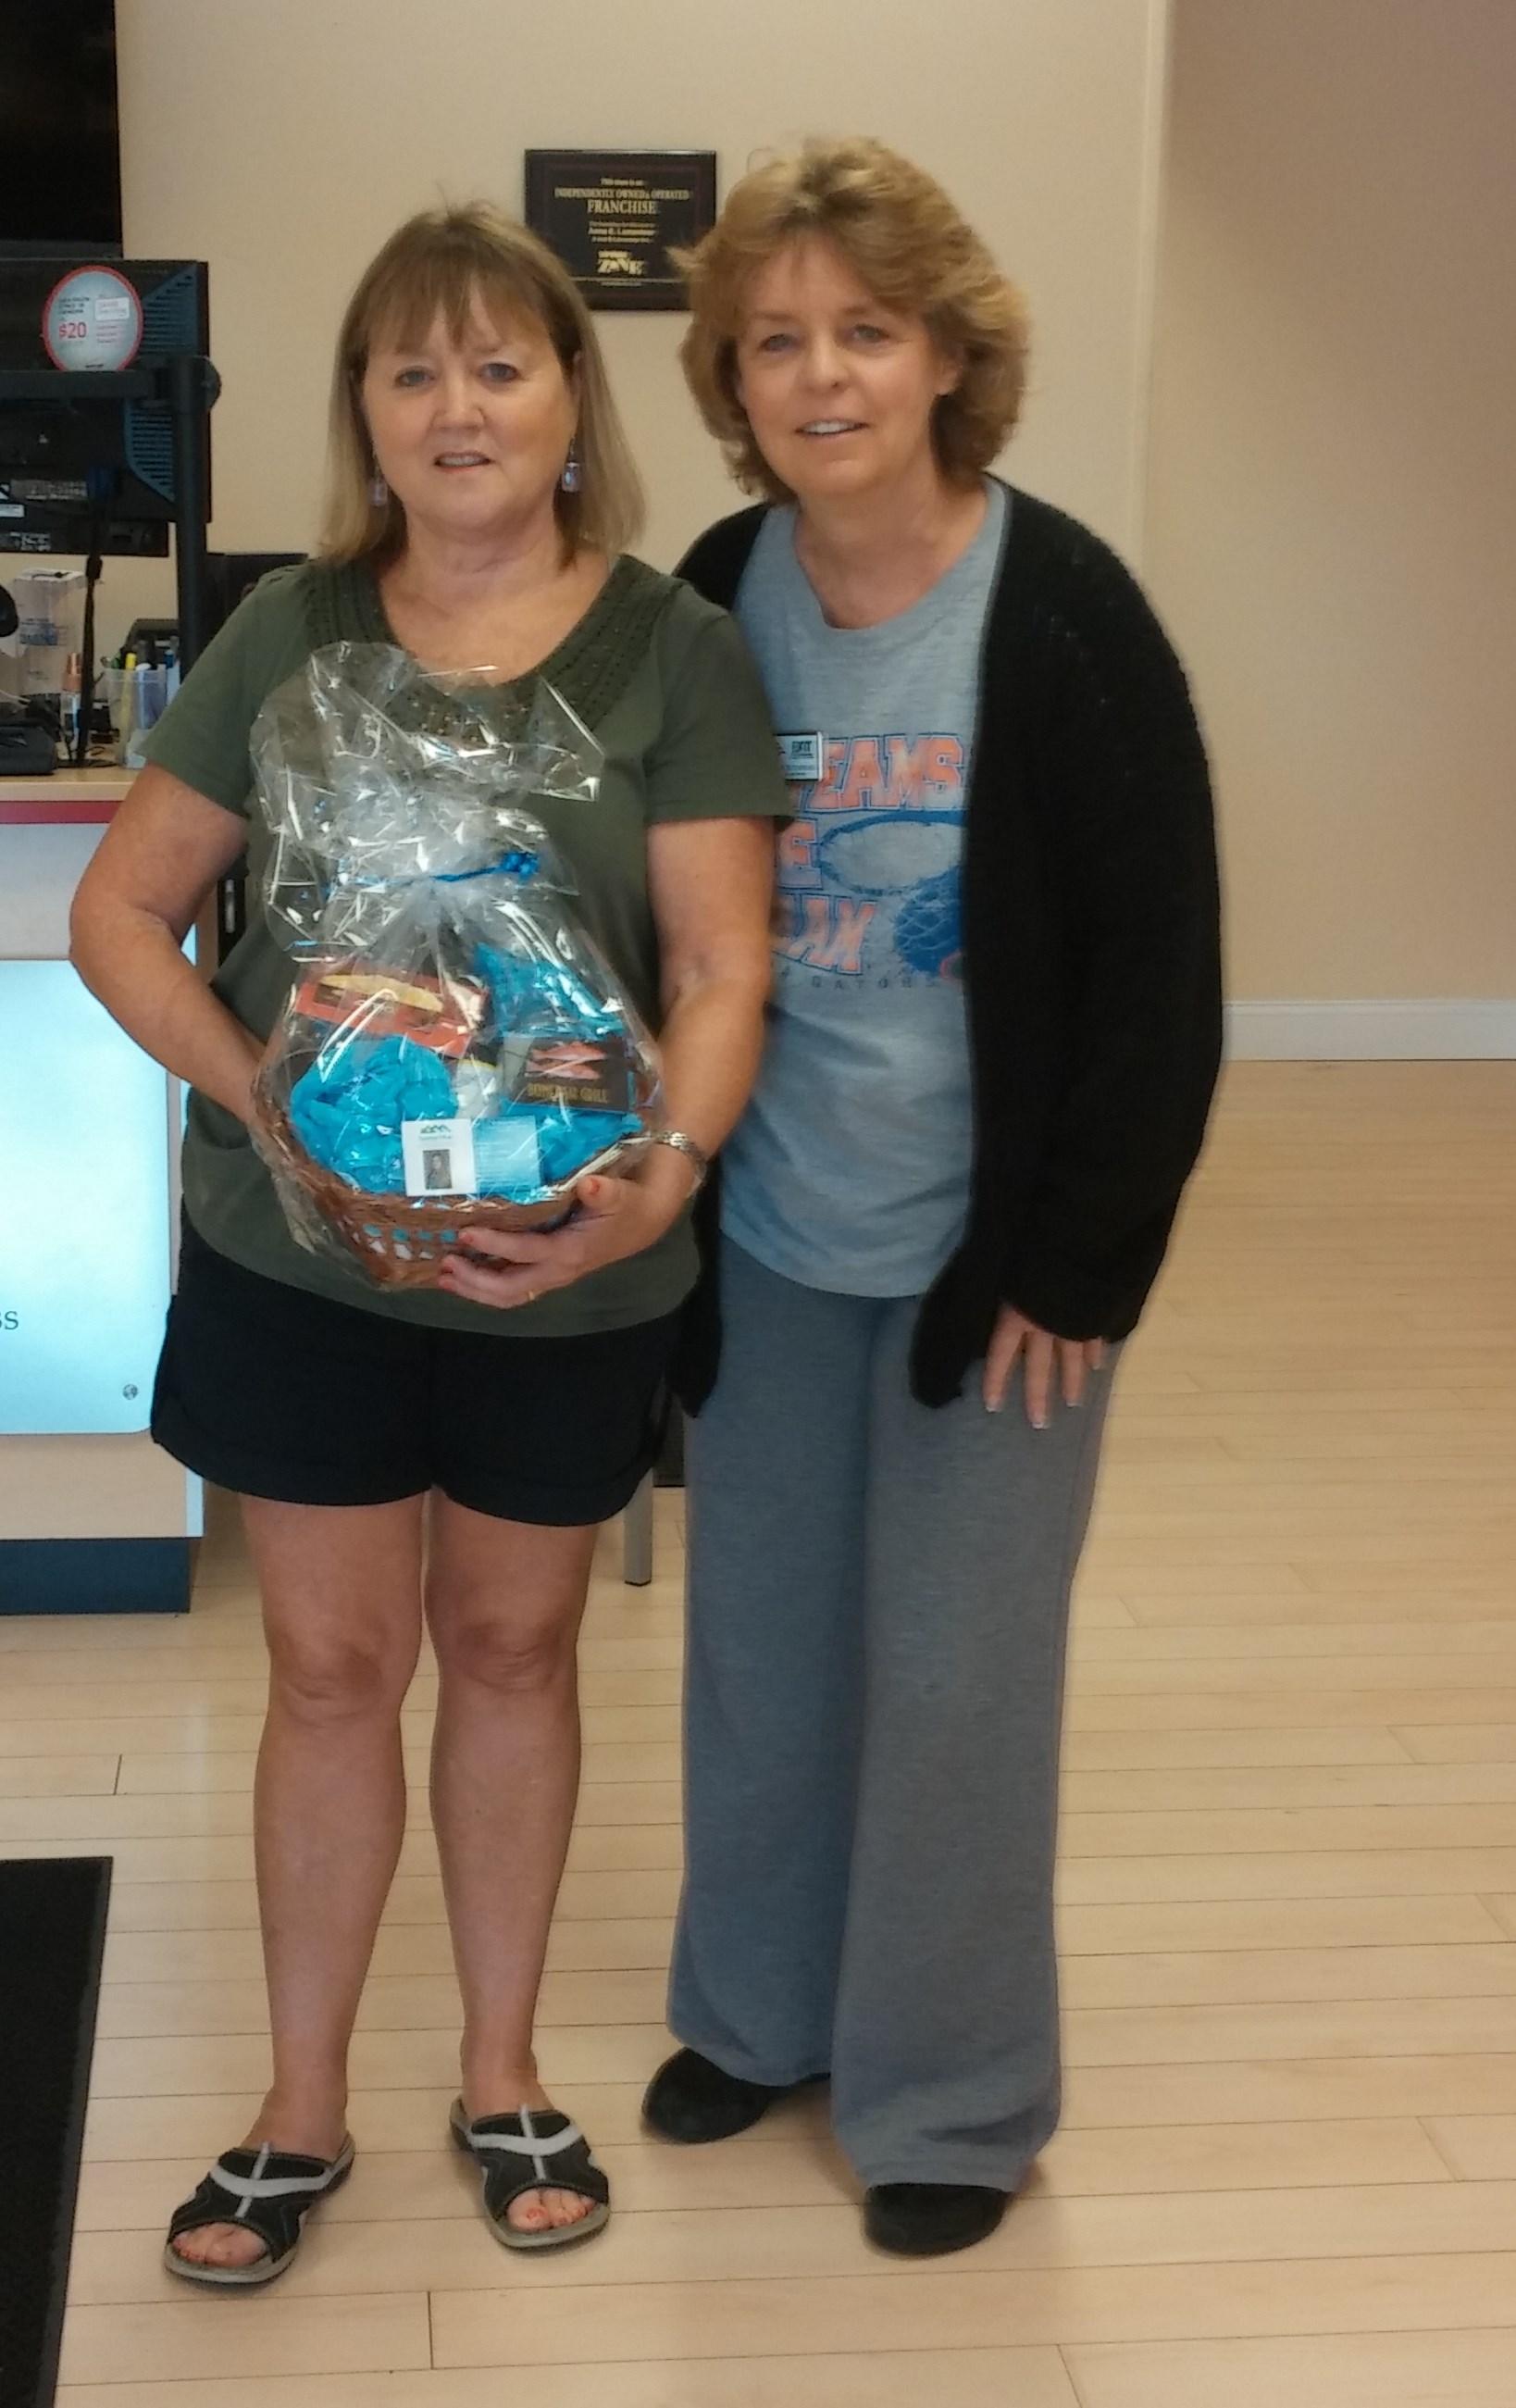 Judy Rothermel, Robin Eble Presenting the winnner Barbara George their Date night basket from the Taste of Medford